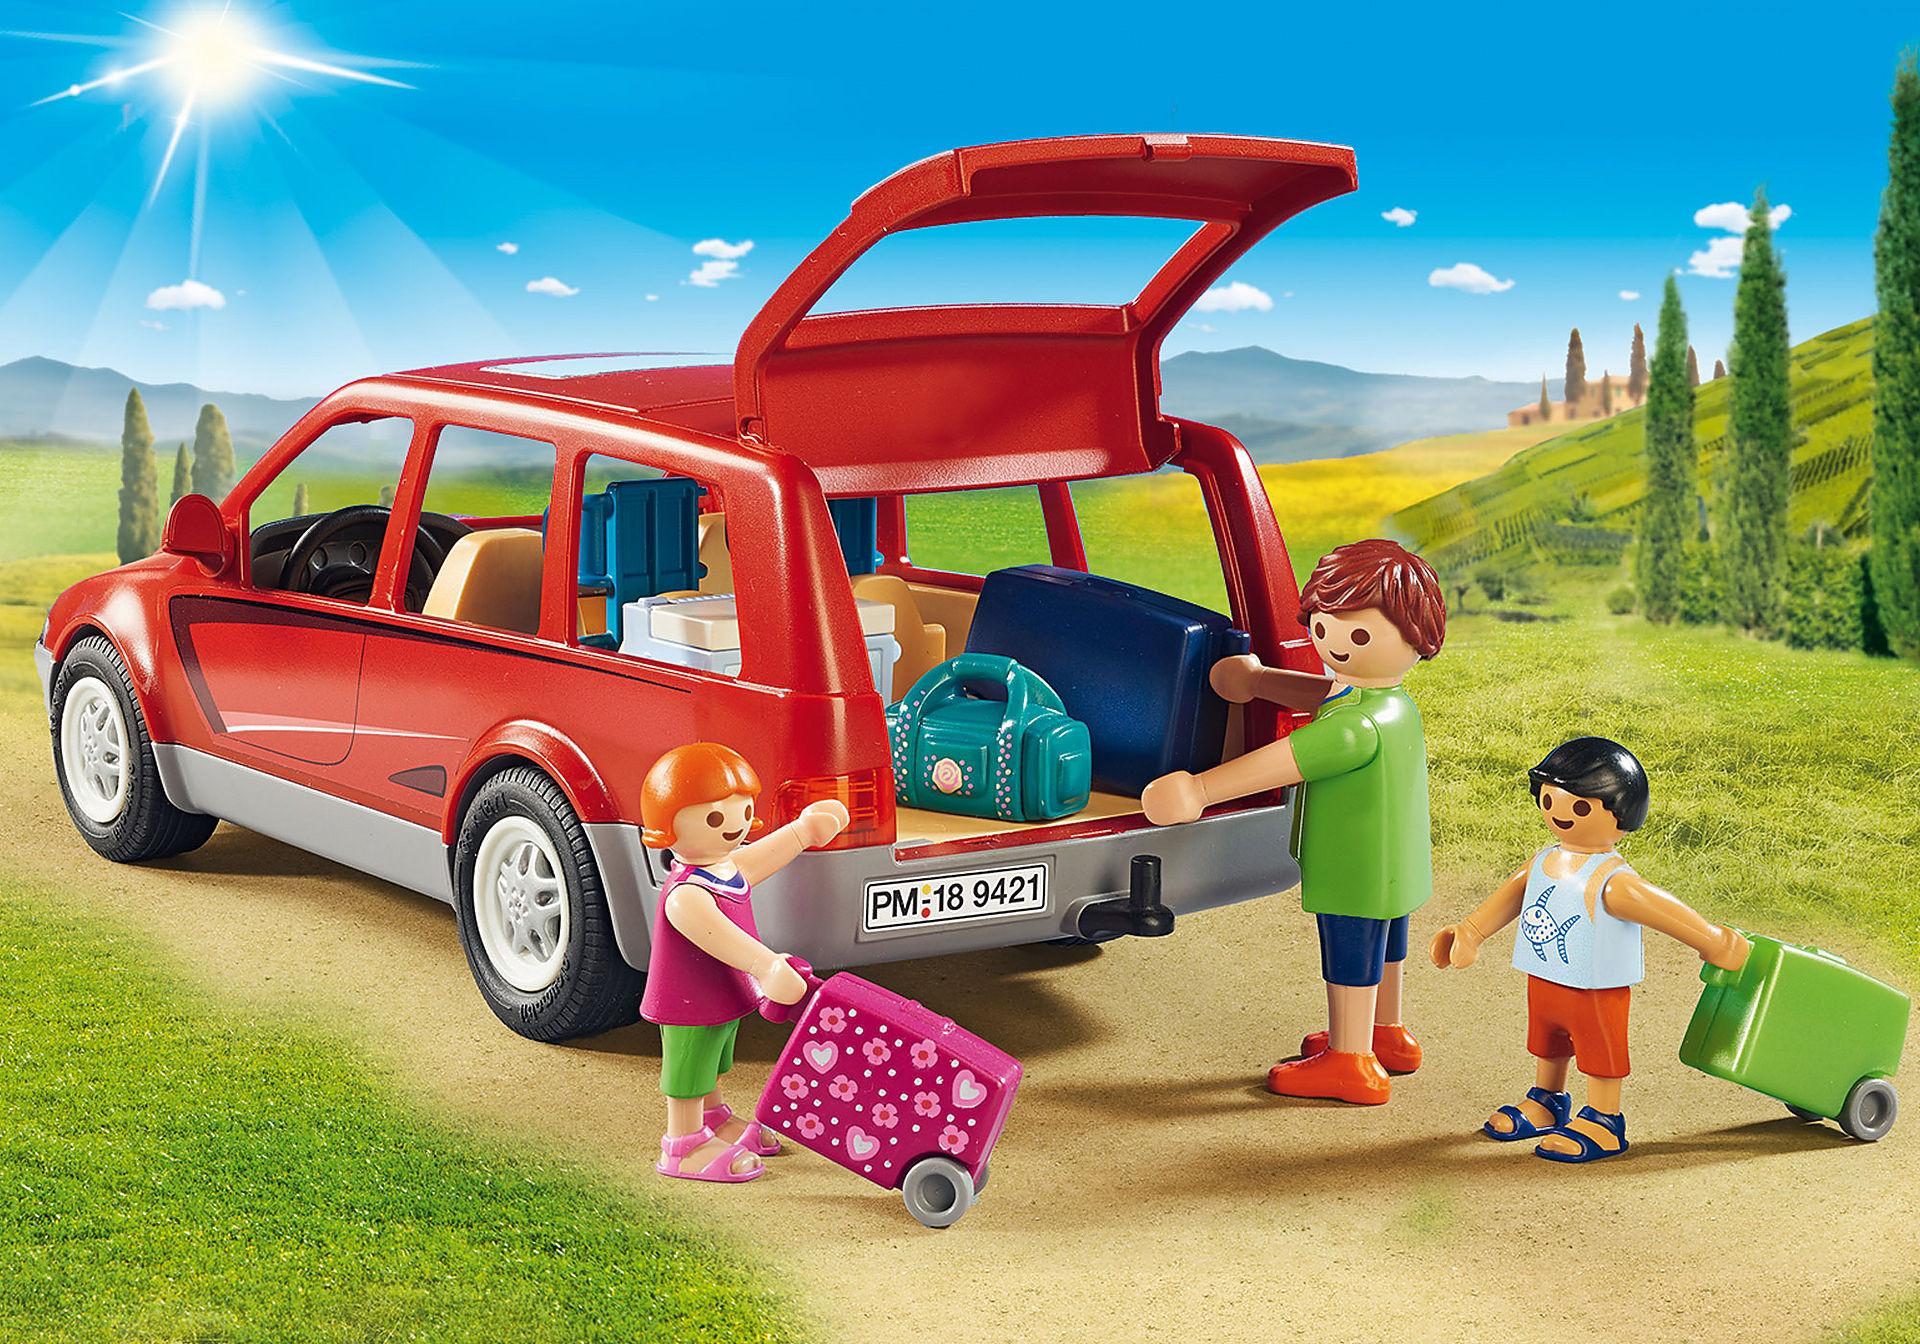 http://media.playmobil.com/i/playmobil/9421_product_extra1/Familien-PKW